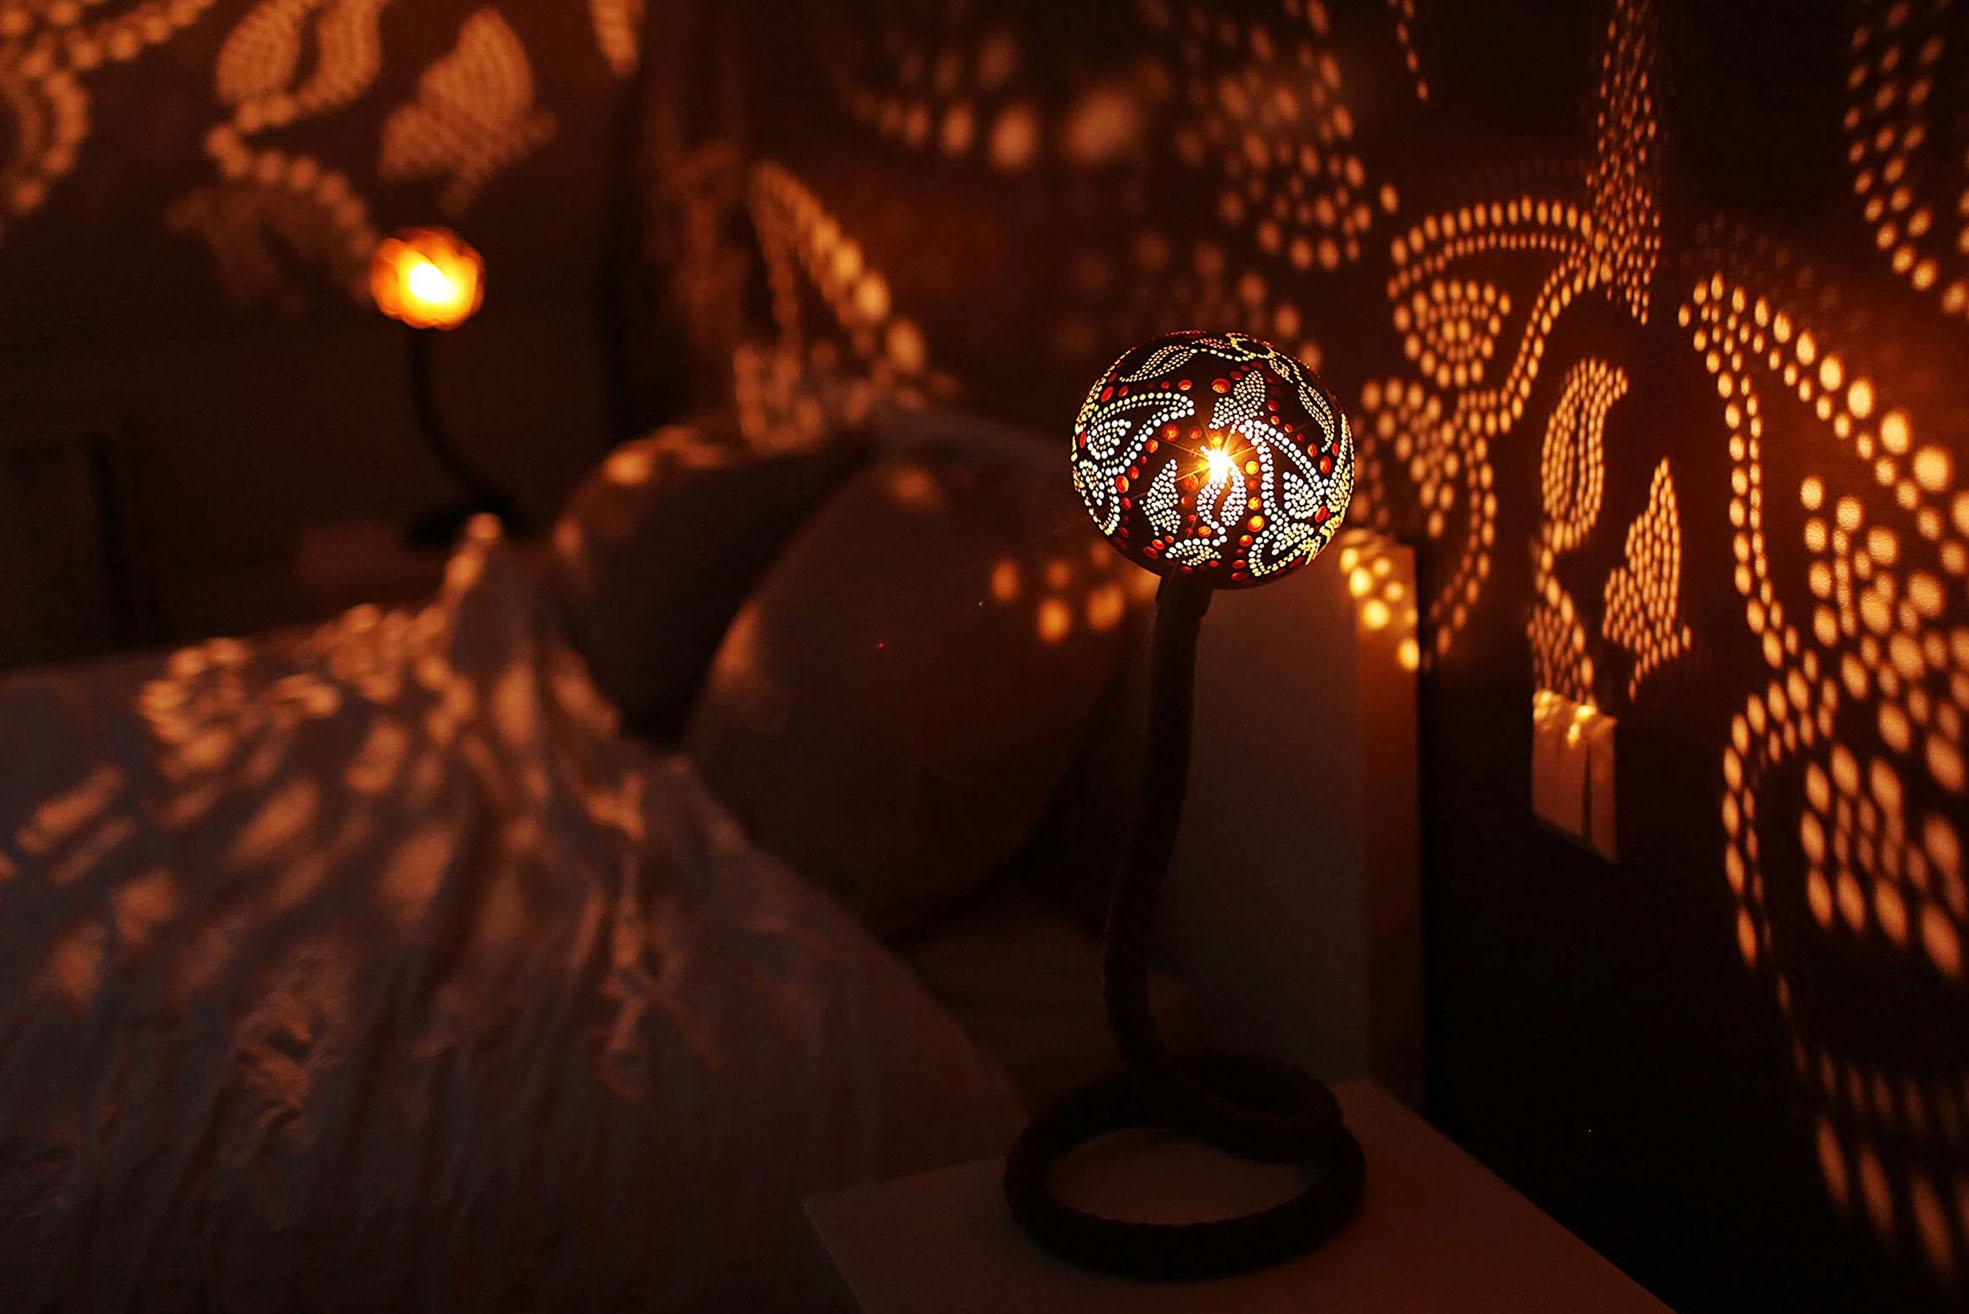 Handgjord magisk lampa från Nymphs Workshop